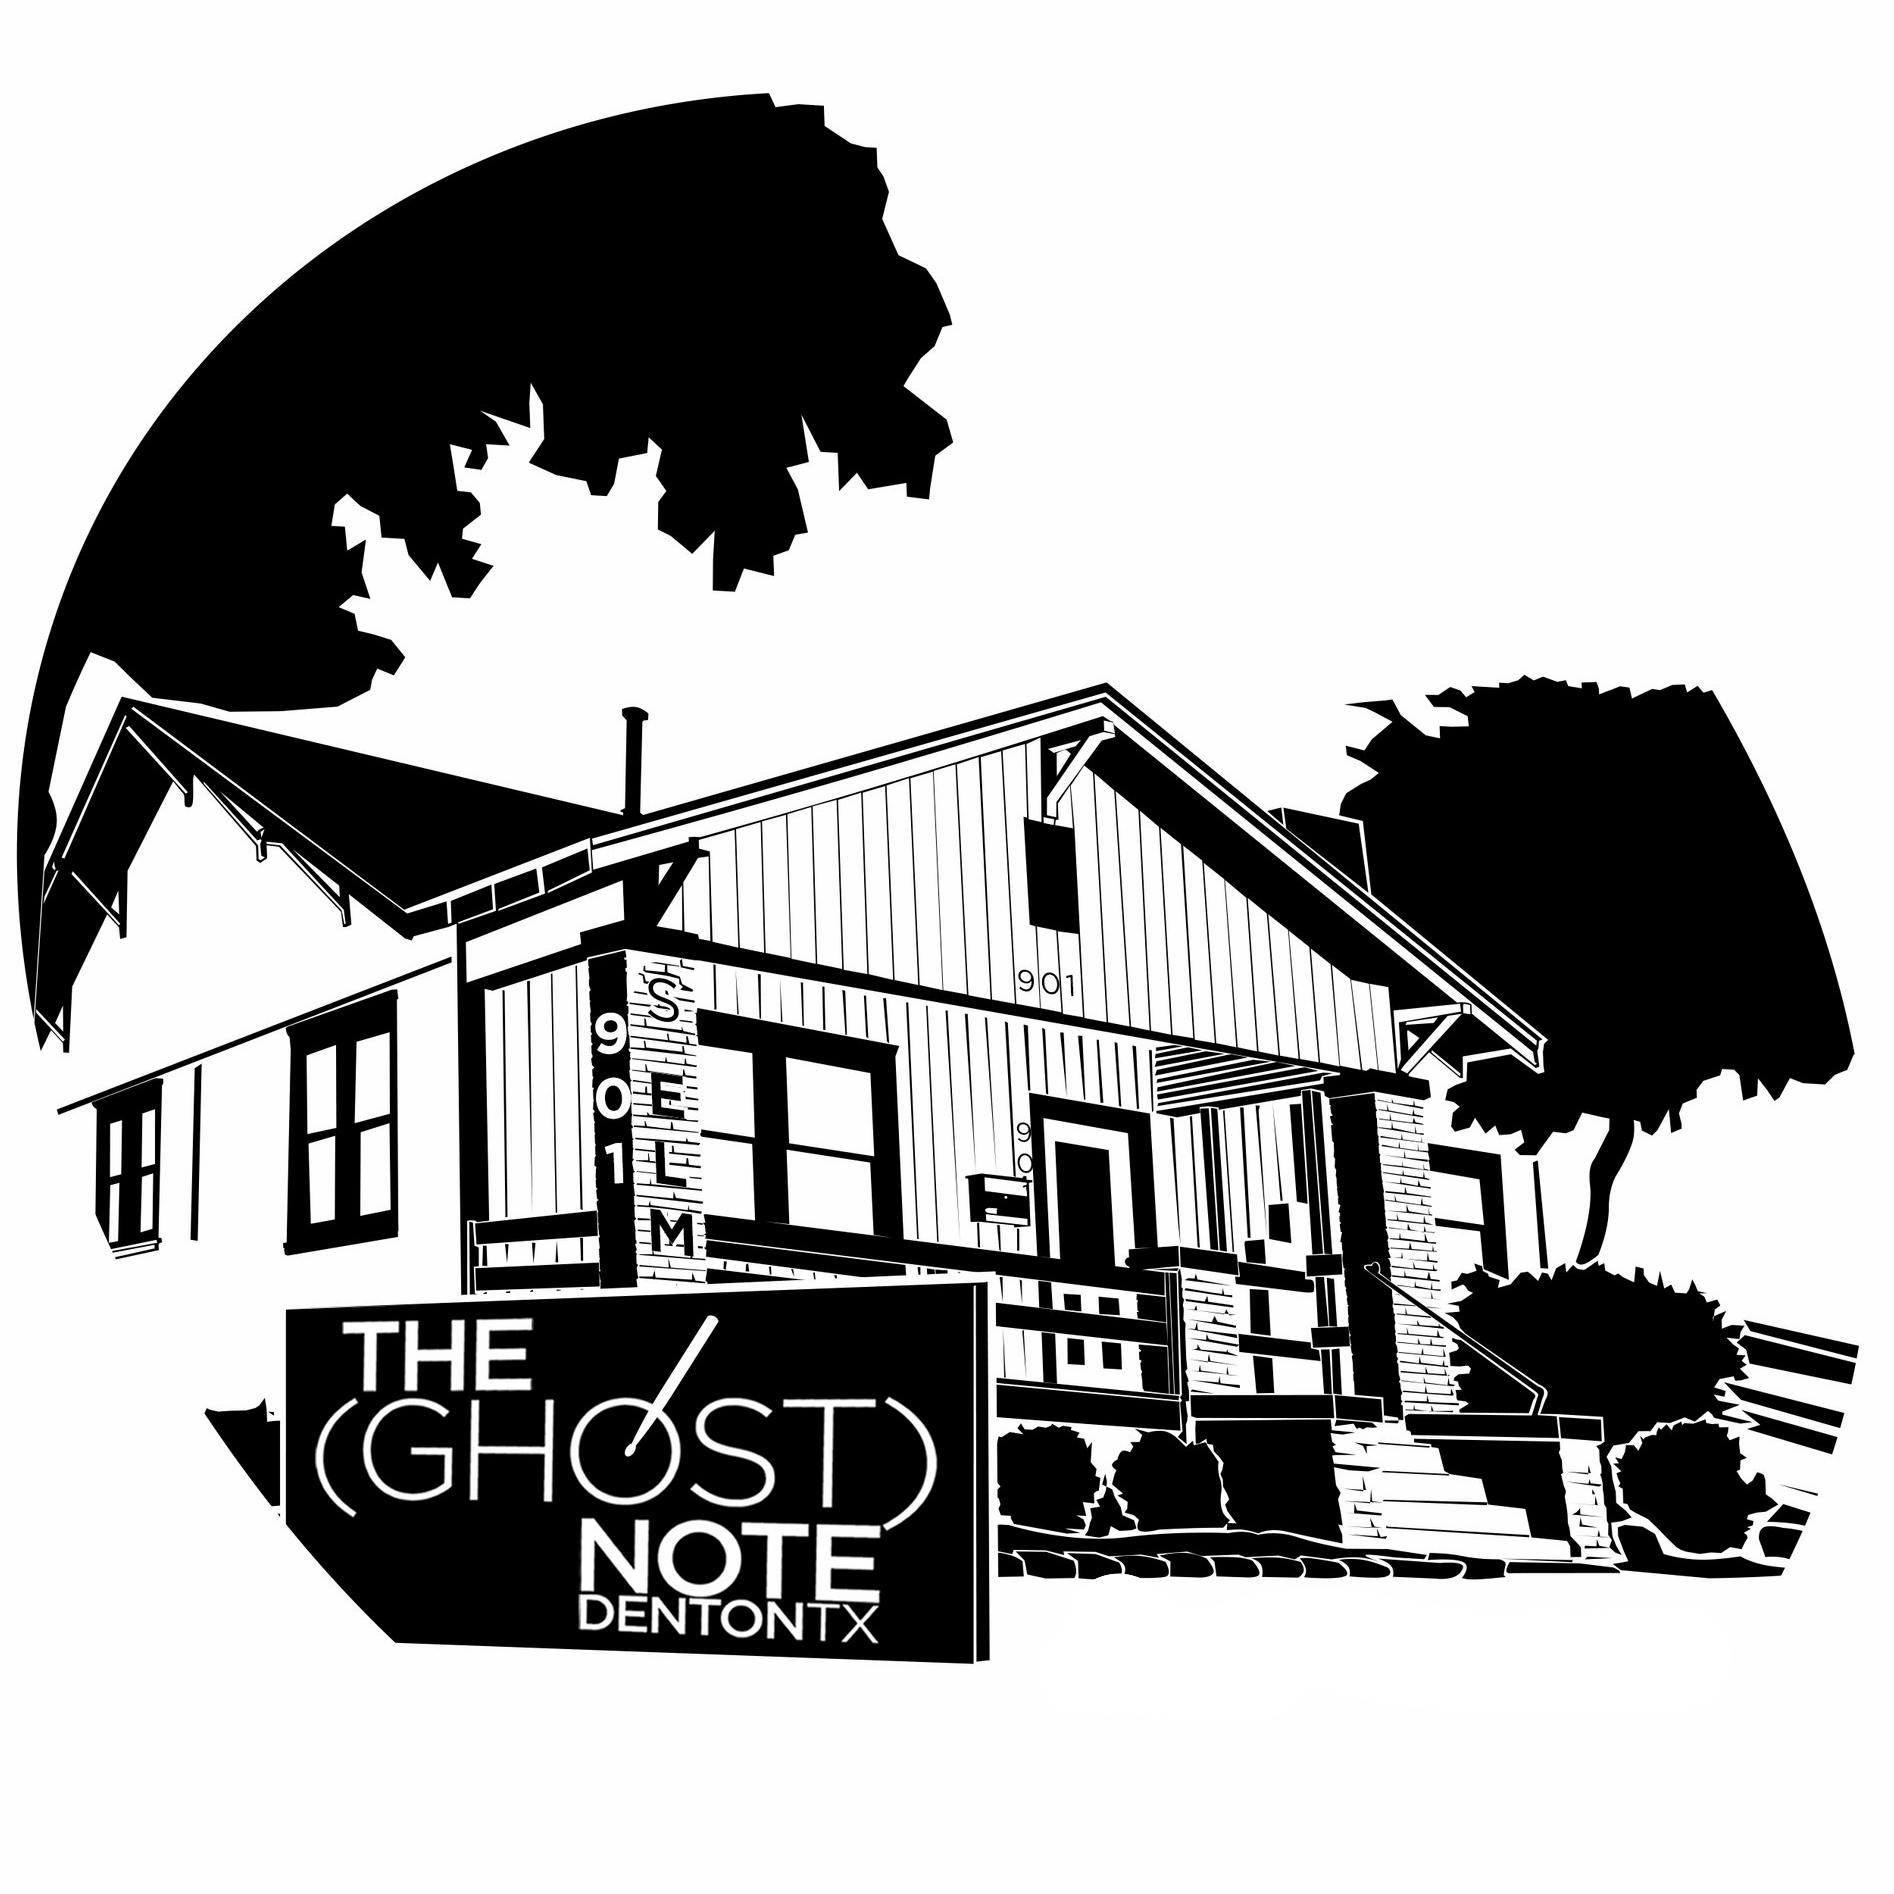 DRUM SHOP & MUSIC SCHOOL - 901 S. Elm St.Denton, TX 76201MONDAY -SATURDAY: 12-8pm